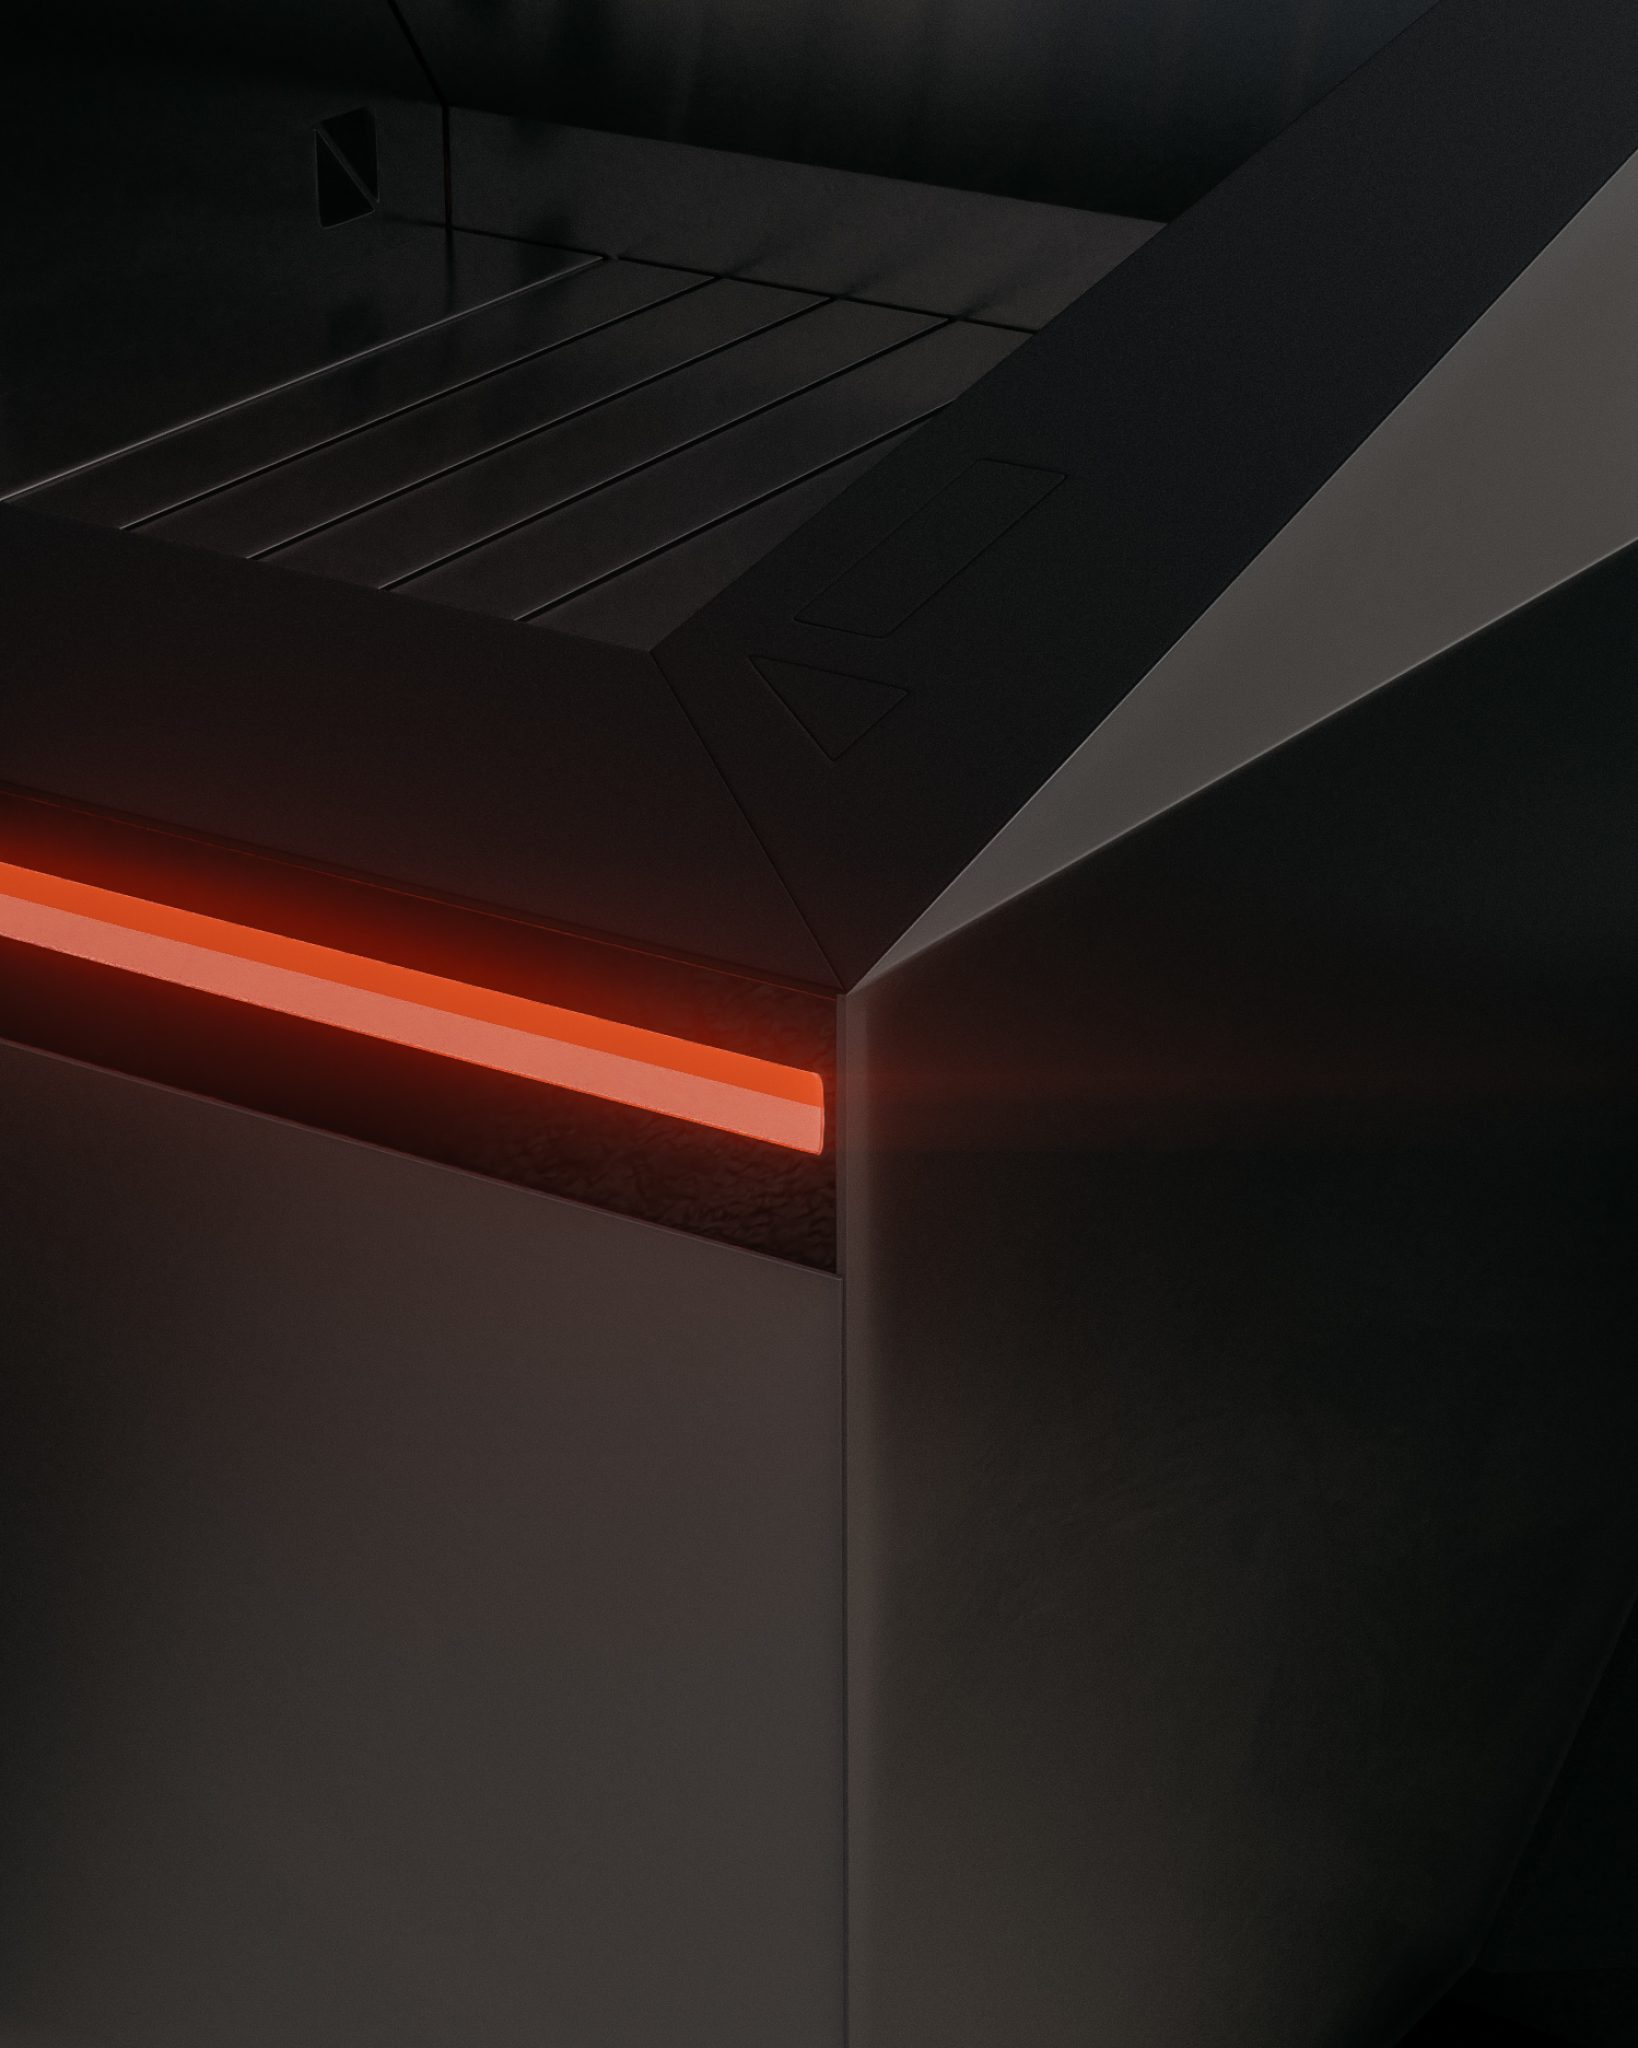 ignant-tesla-cybertruck-cgi-brutalism-cgi-editorial-11-1638×2048